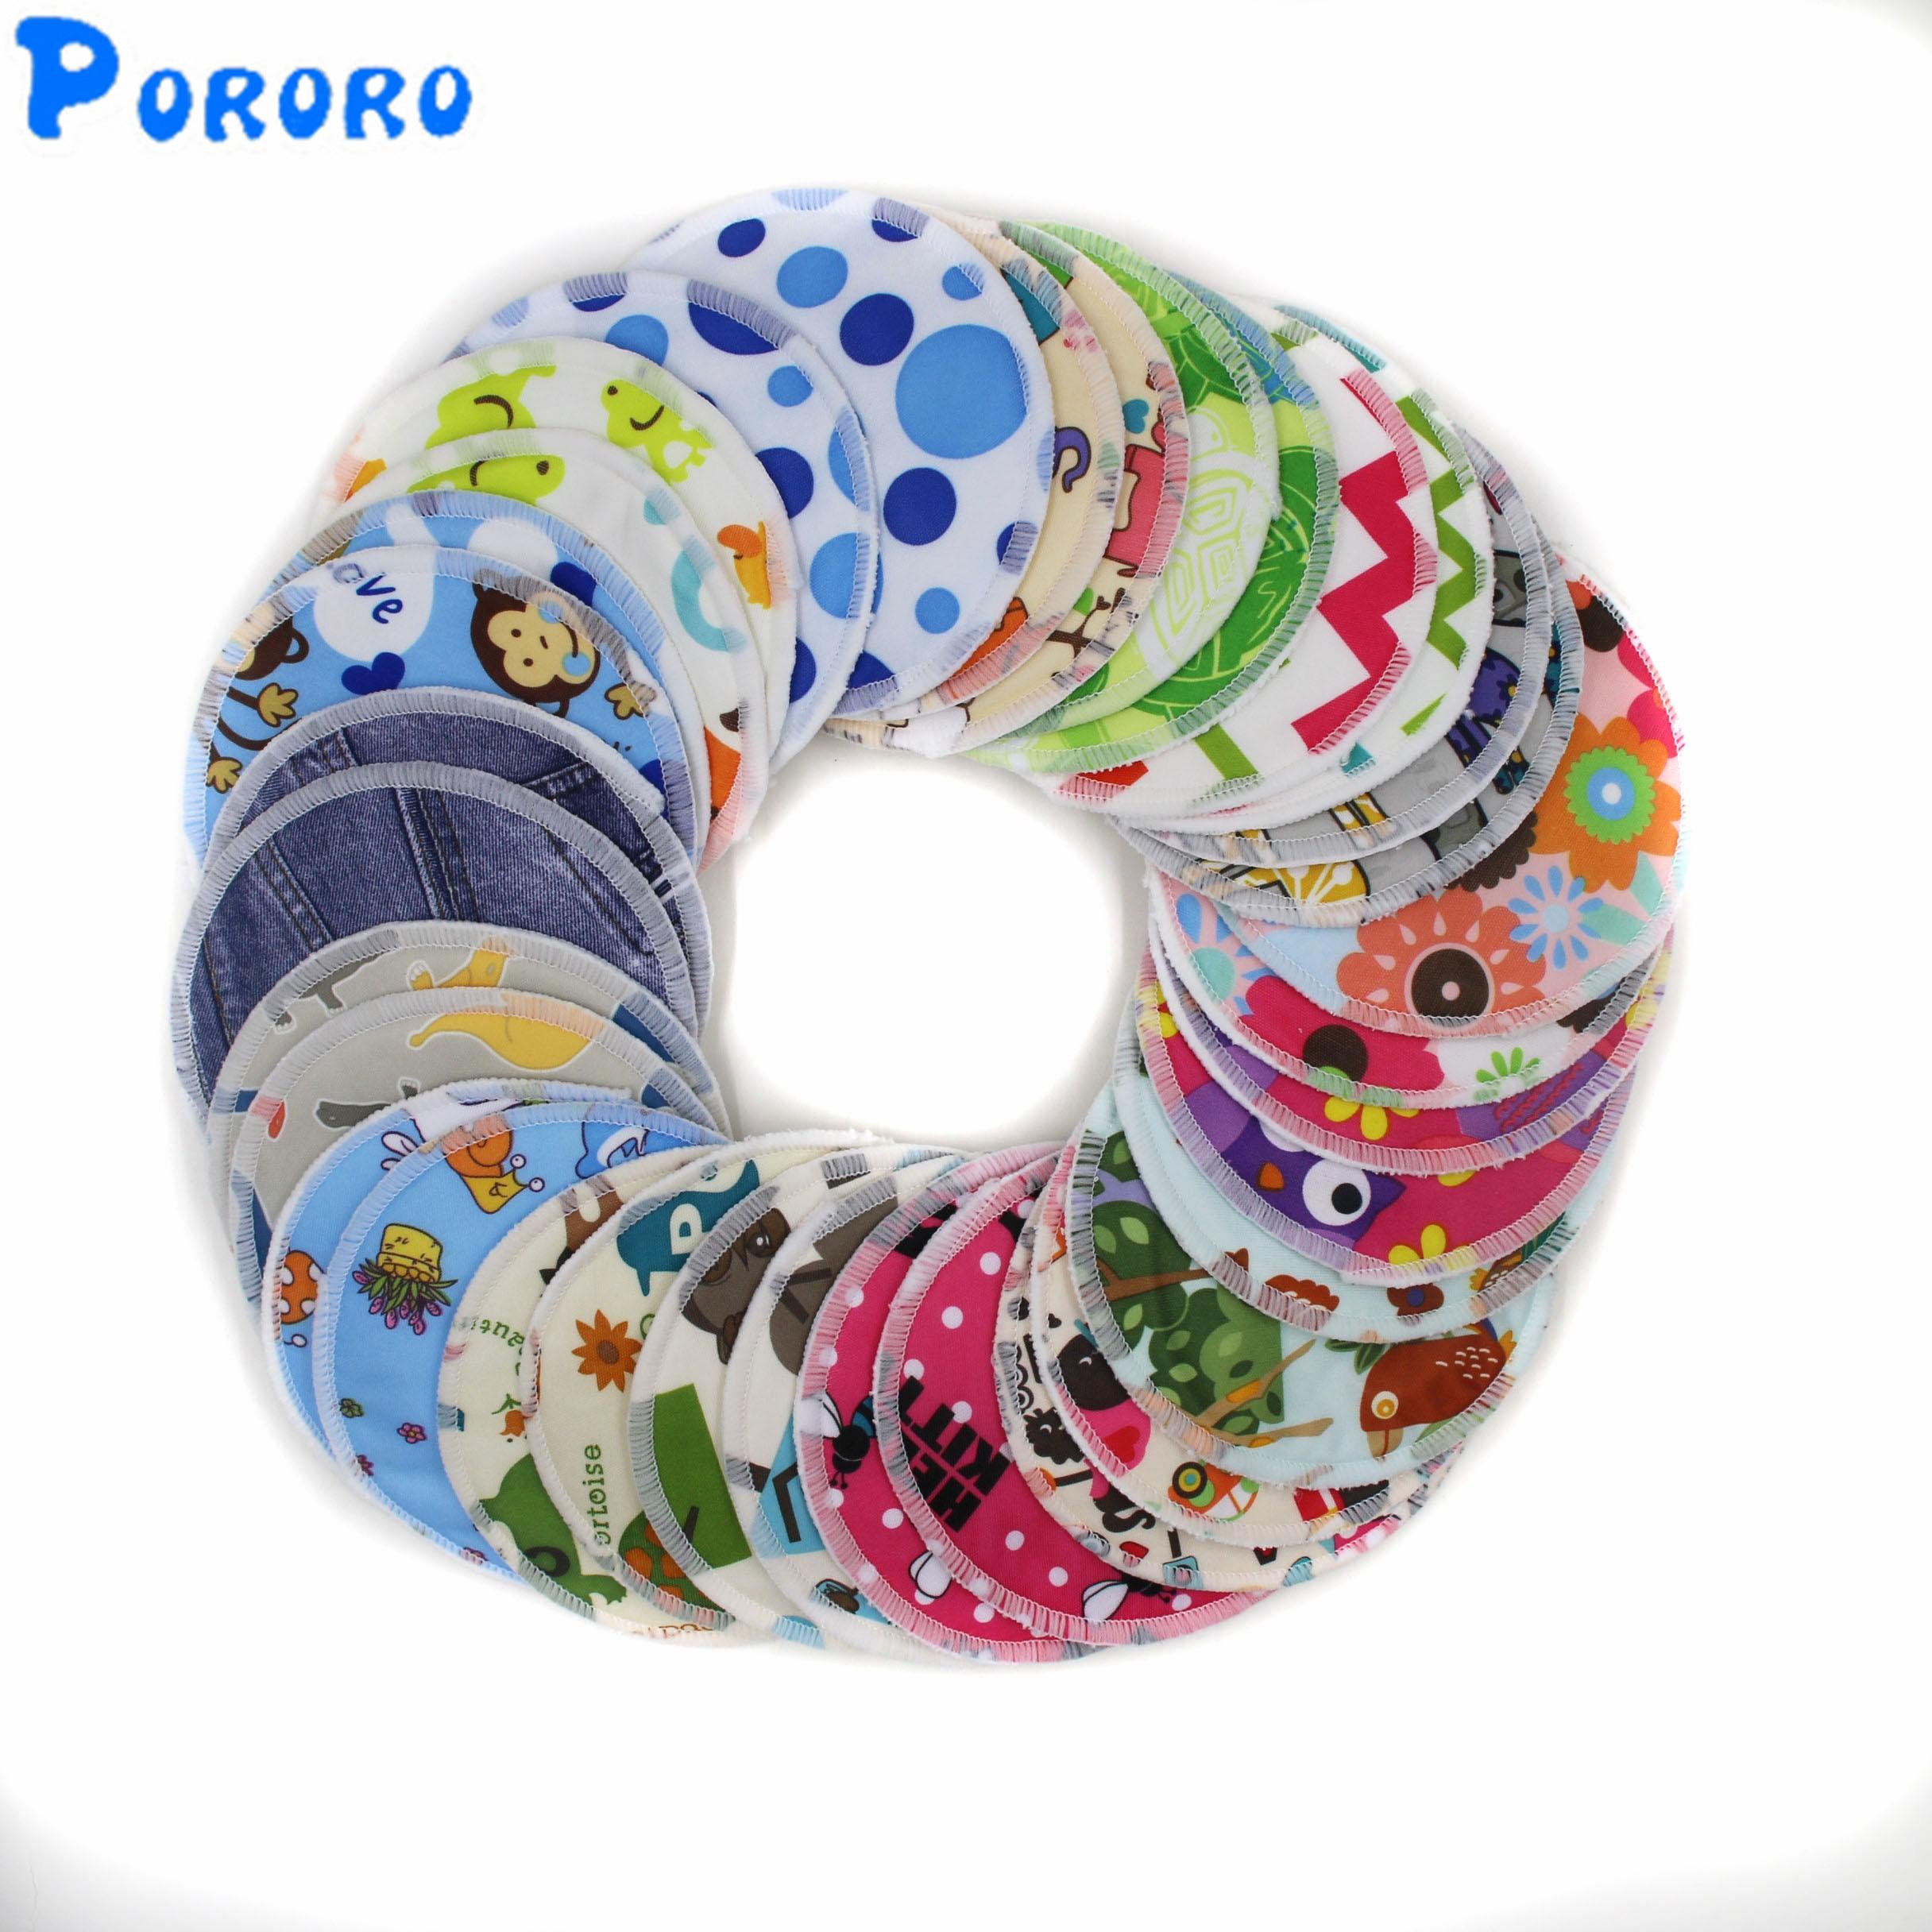 10 Pcs/lot Pregnant Women Washable Nursing Pads Bamboo Cartoon Print Reusable Nursing Pads Lady Breastfeeding Pads Color Random